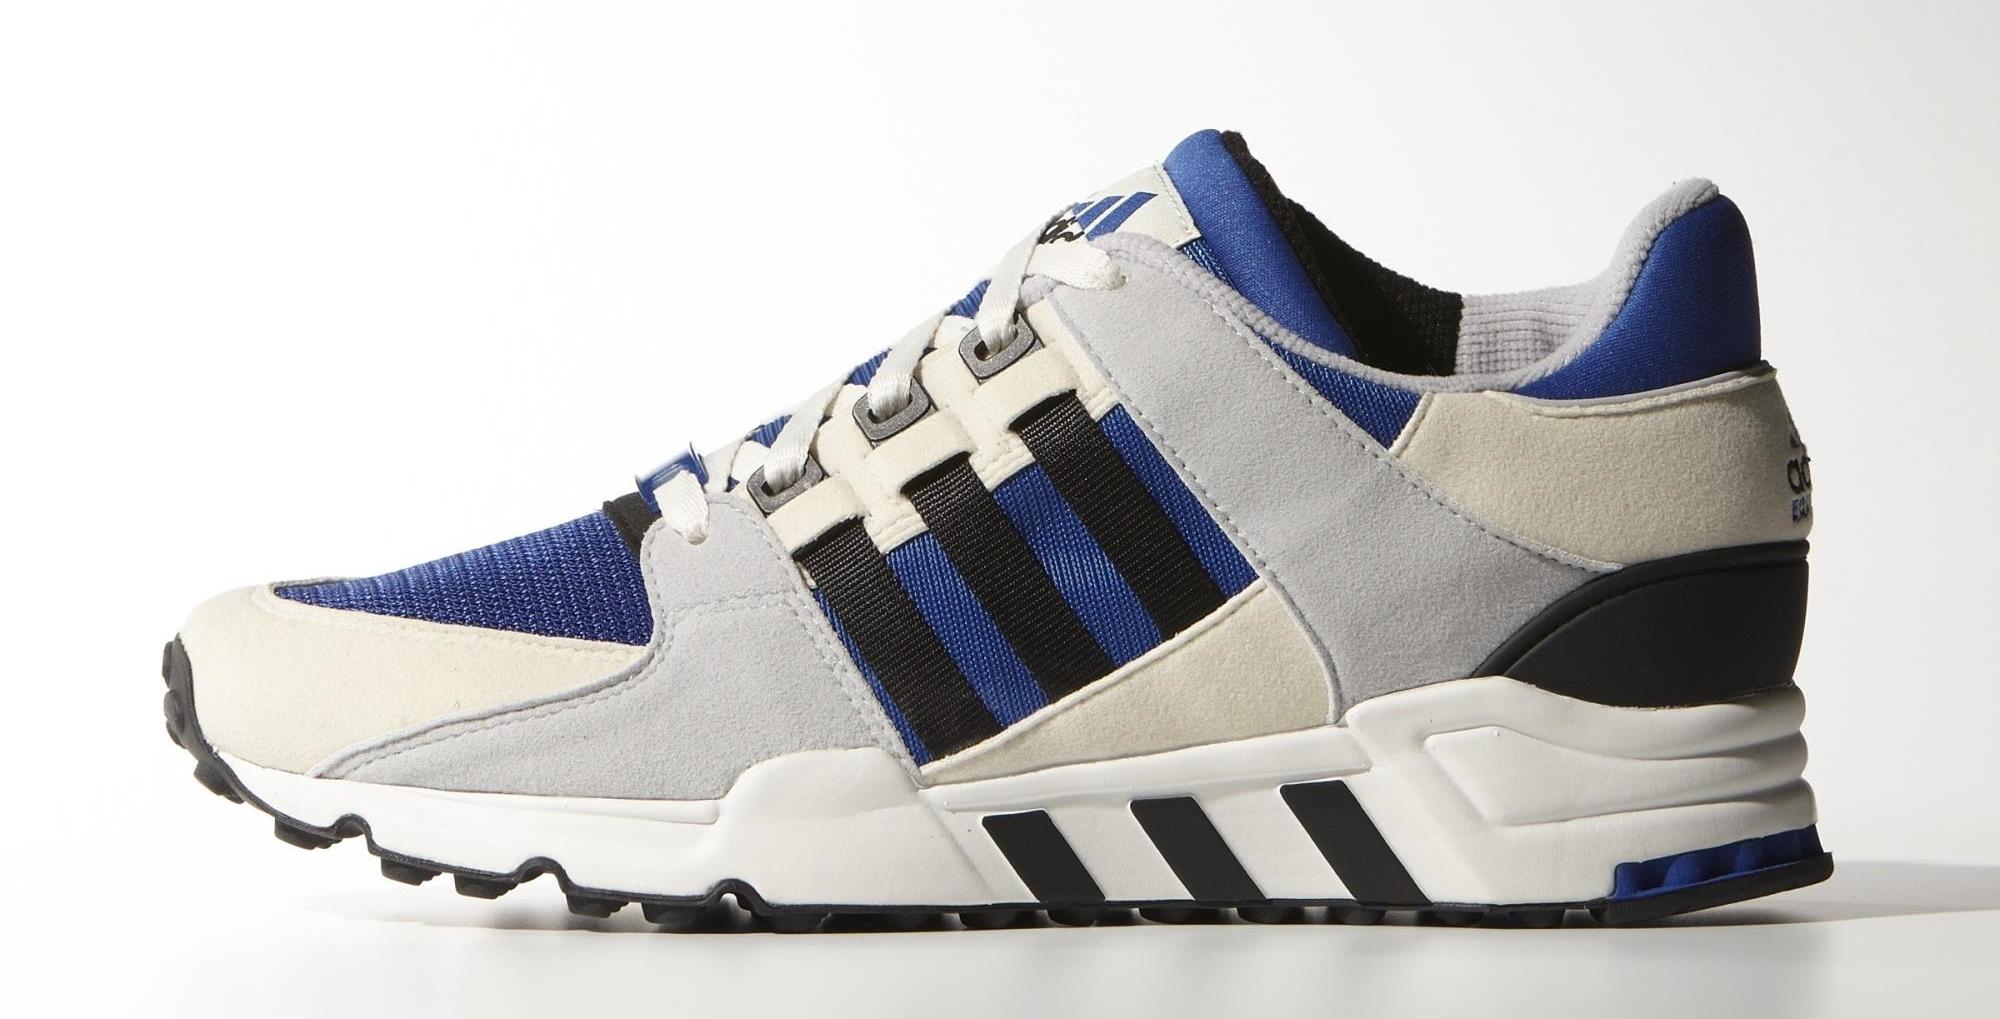 Adidas Originals EQT Support 93 OG Blue